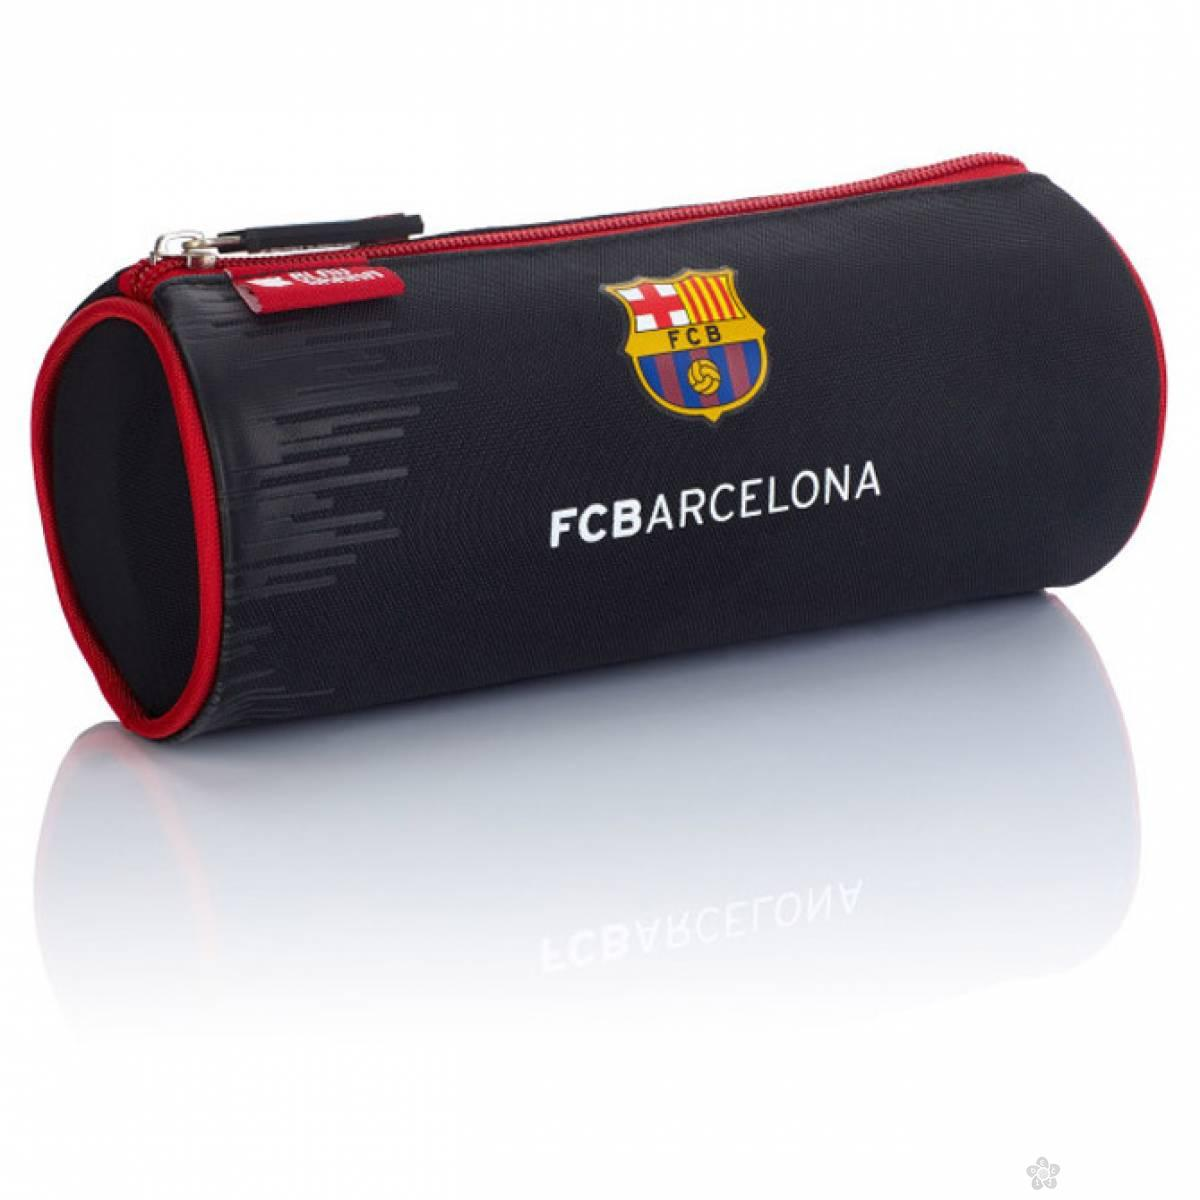 Okrugla pernica FC Barcelona 1 zip FC-243 Astra, crno crvena